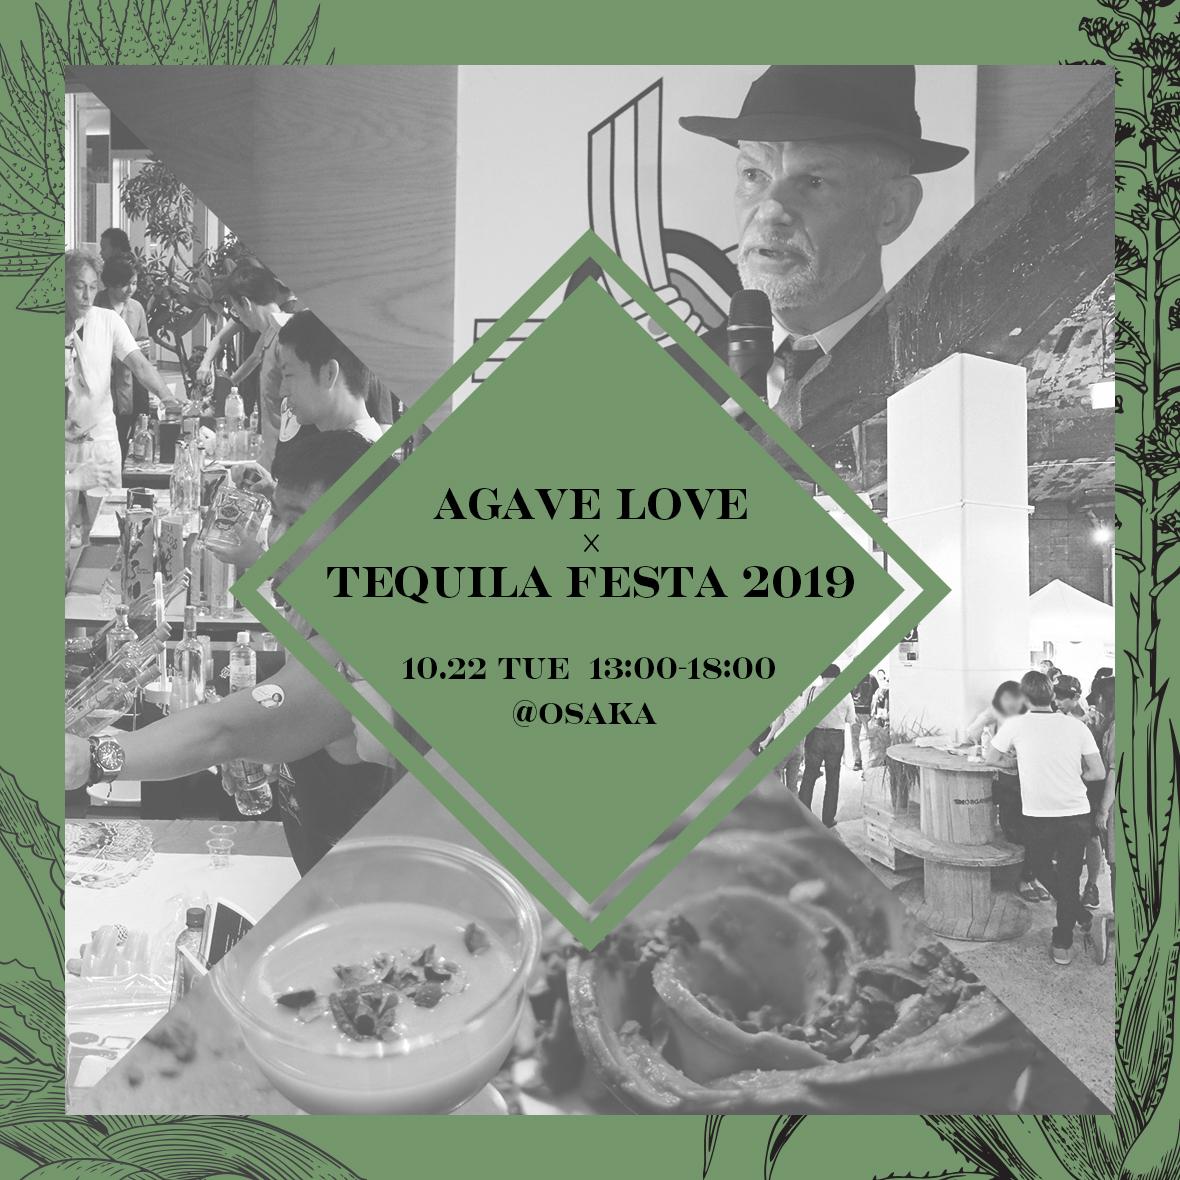 AGAVE LOVE × TEQUILA FESTA 2019 in OSAKA